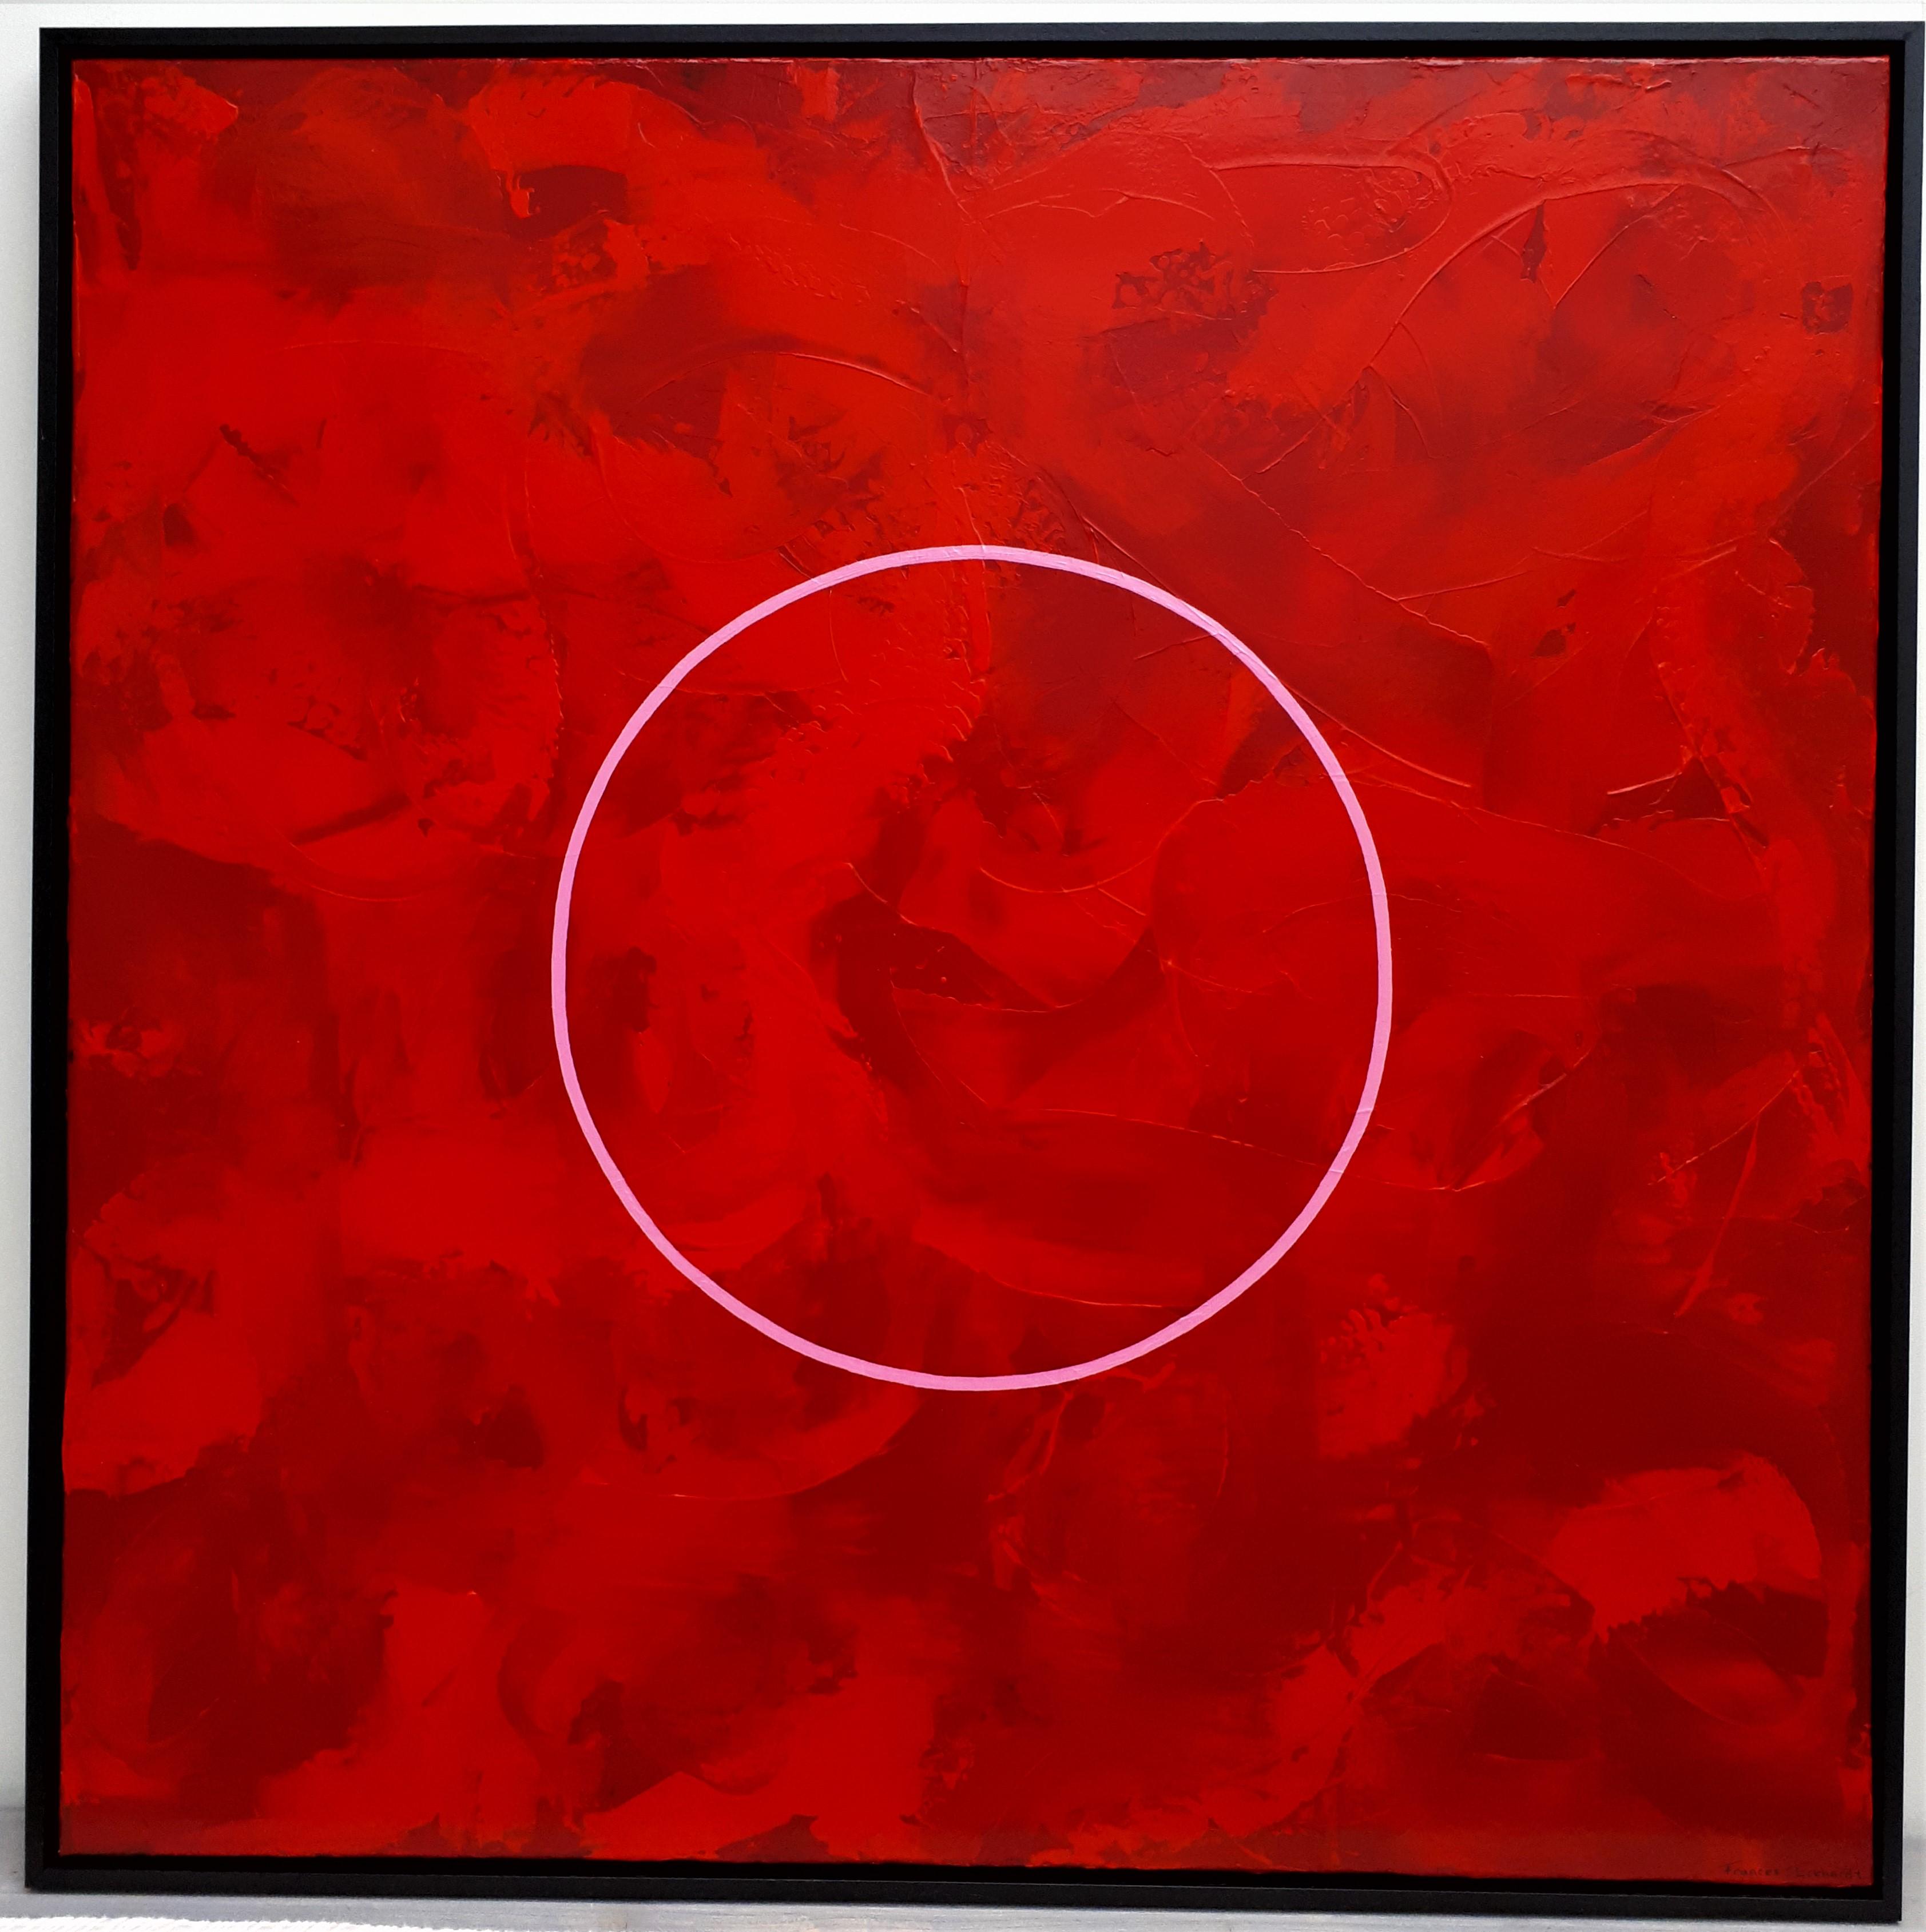 viggo-12 schilderij frances eckhardt